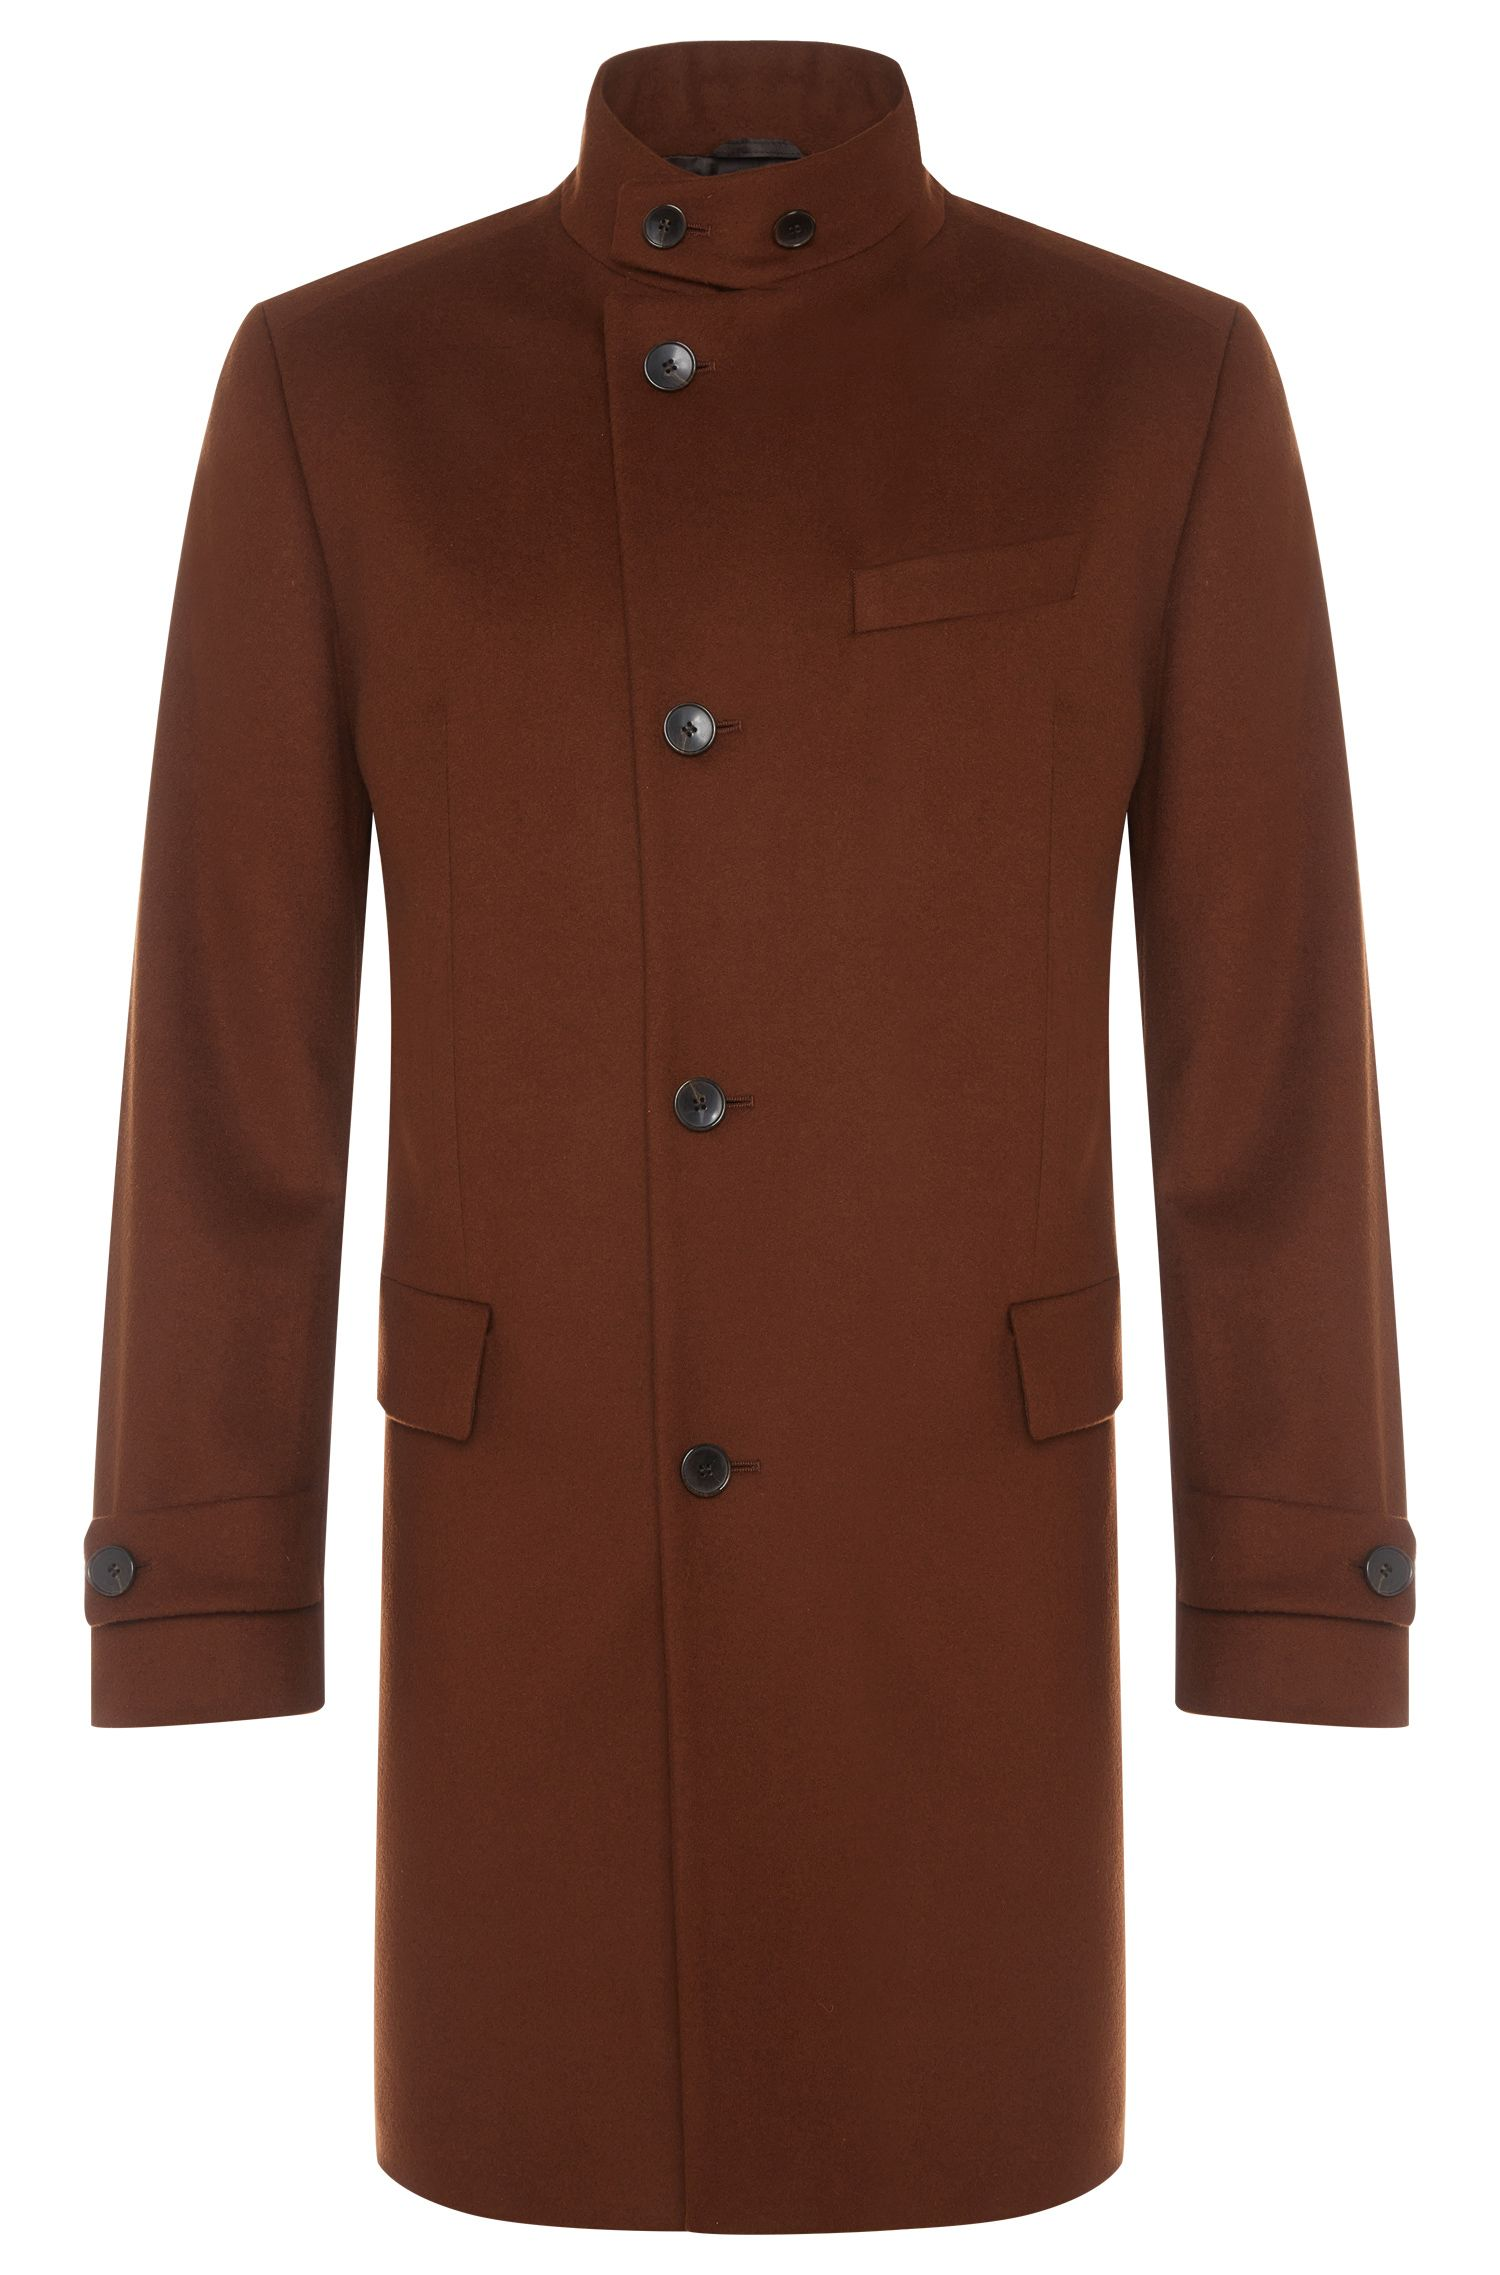 'Sintrax' | Virgin Wool Cashmere Three-Quarter Coat